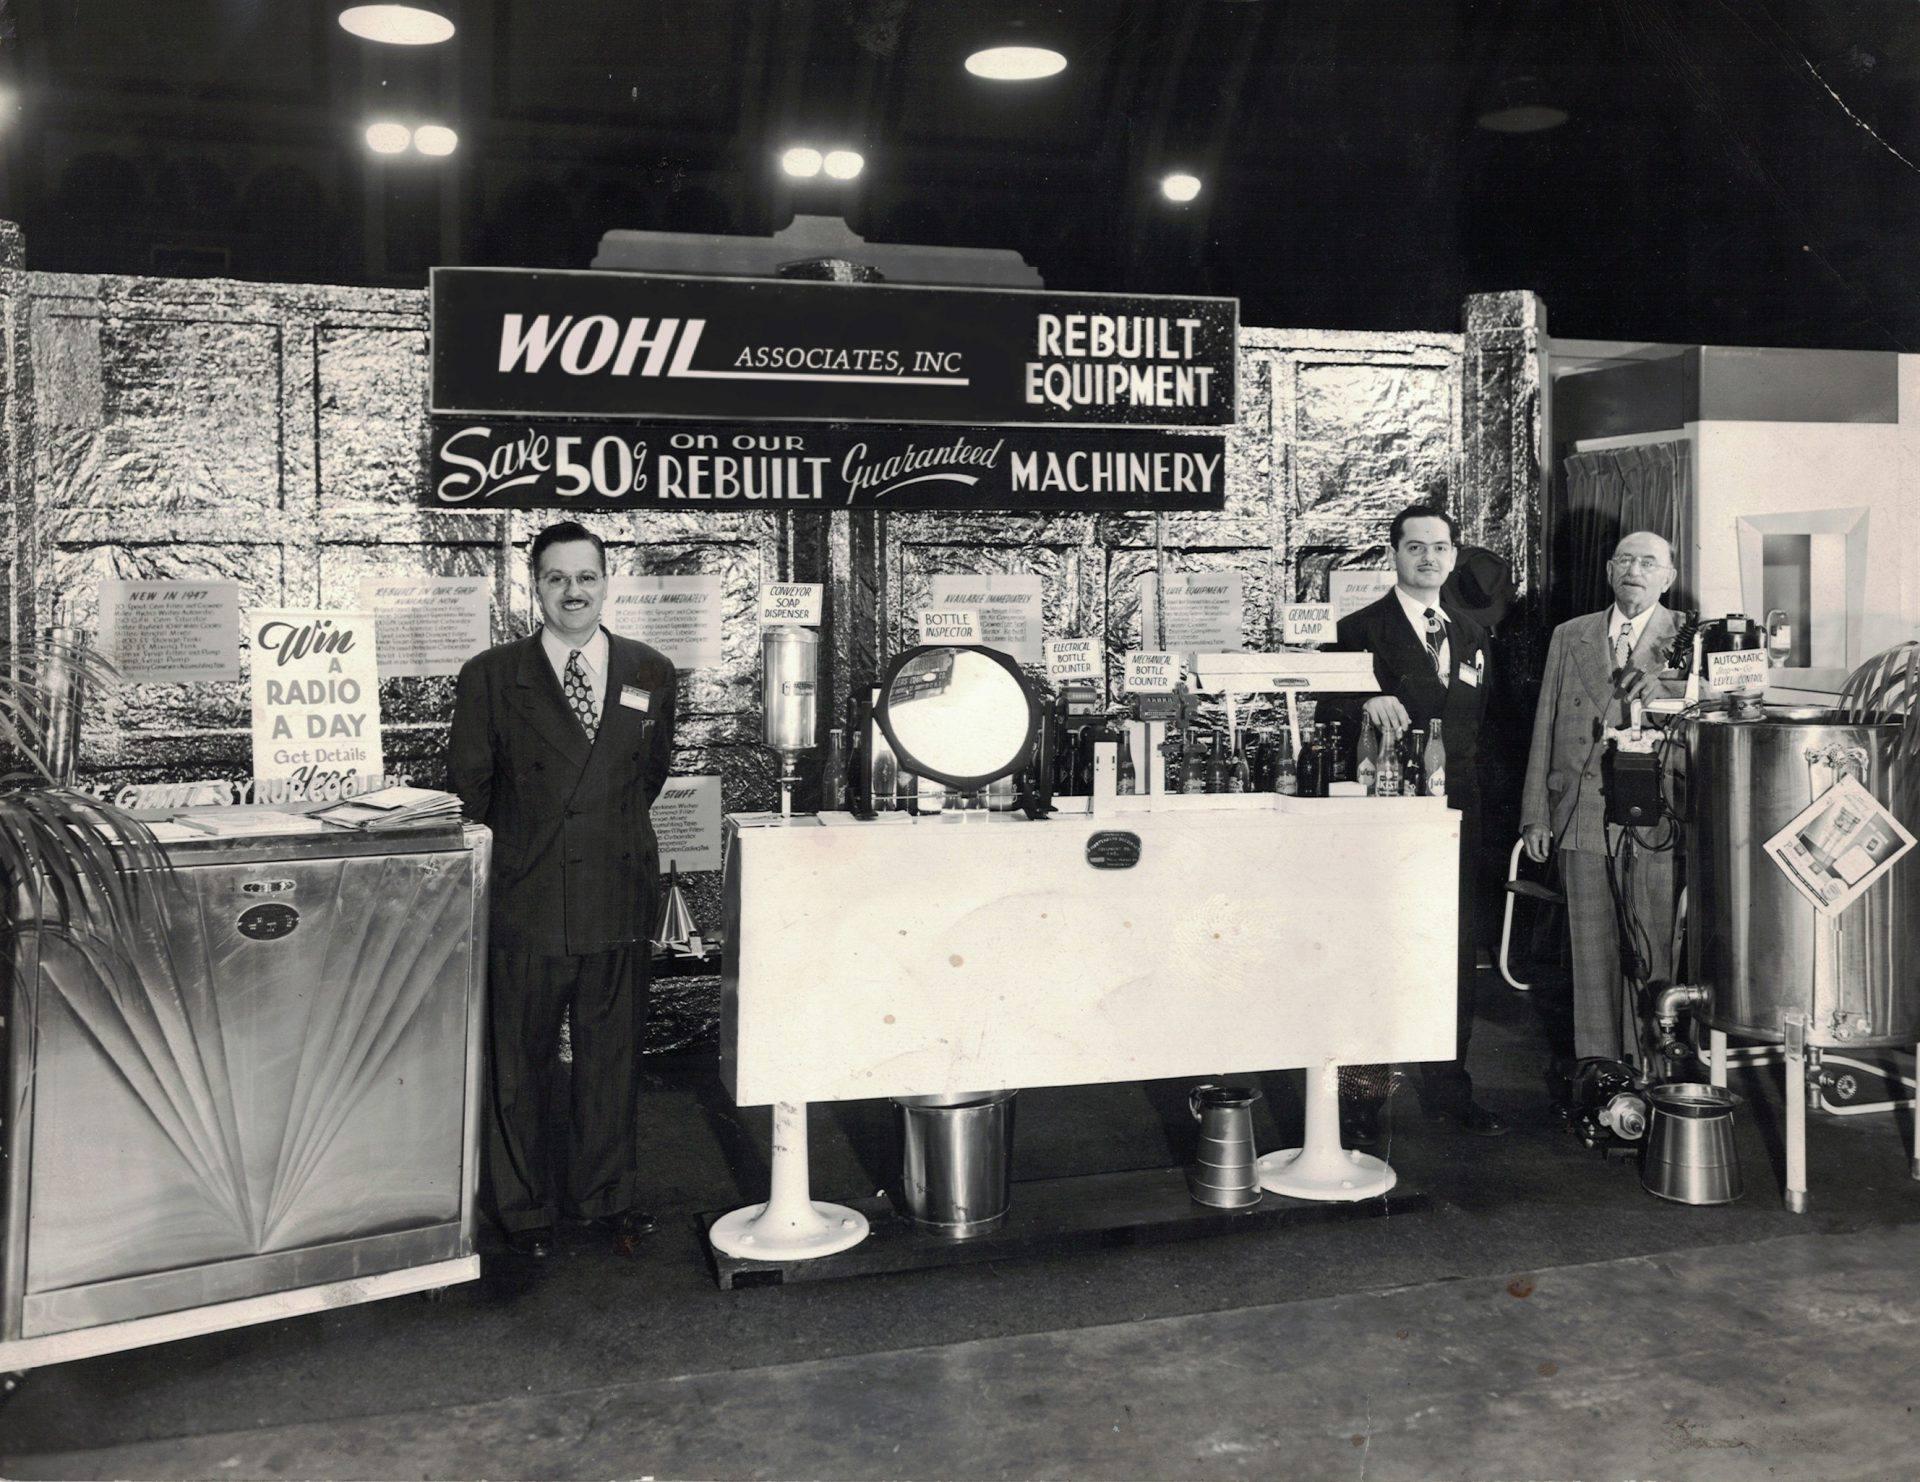 Wohl Associates used equipment